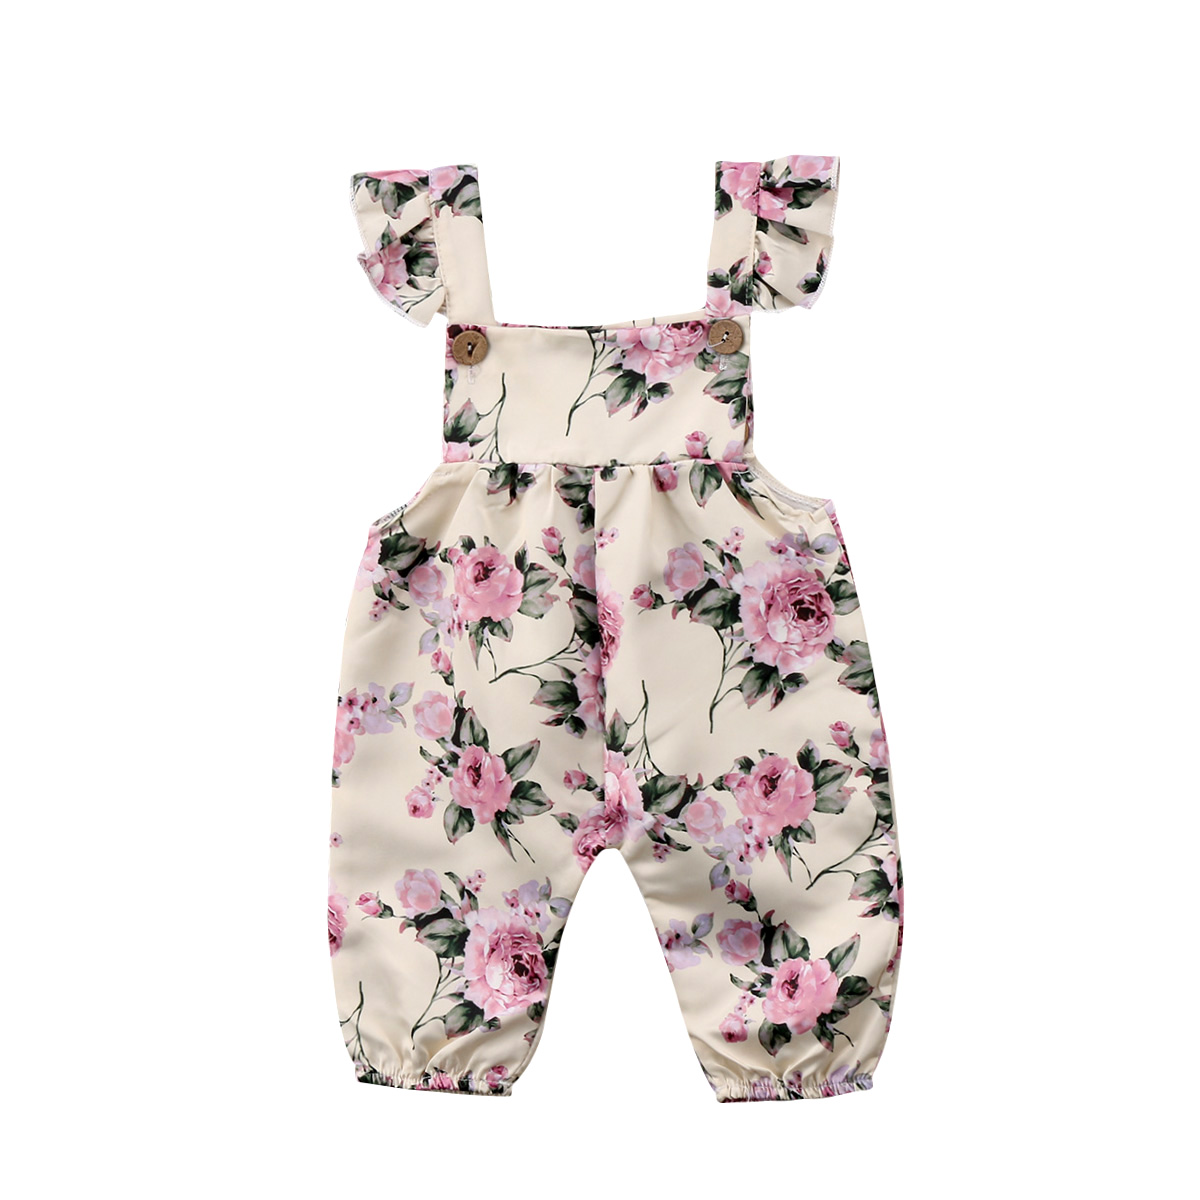 Onefa Newborn Infant Baby Girls Clothing Set Floral Romper Jumpsuit Denim Strap Skirt